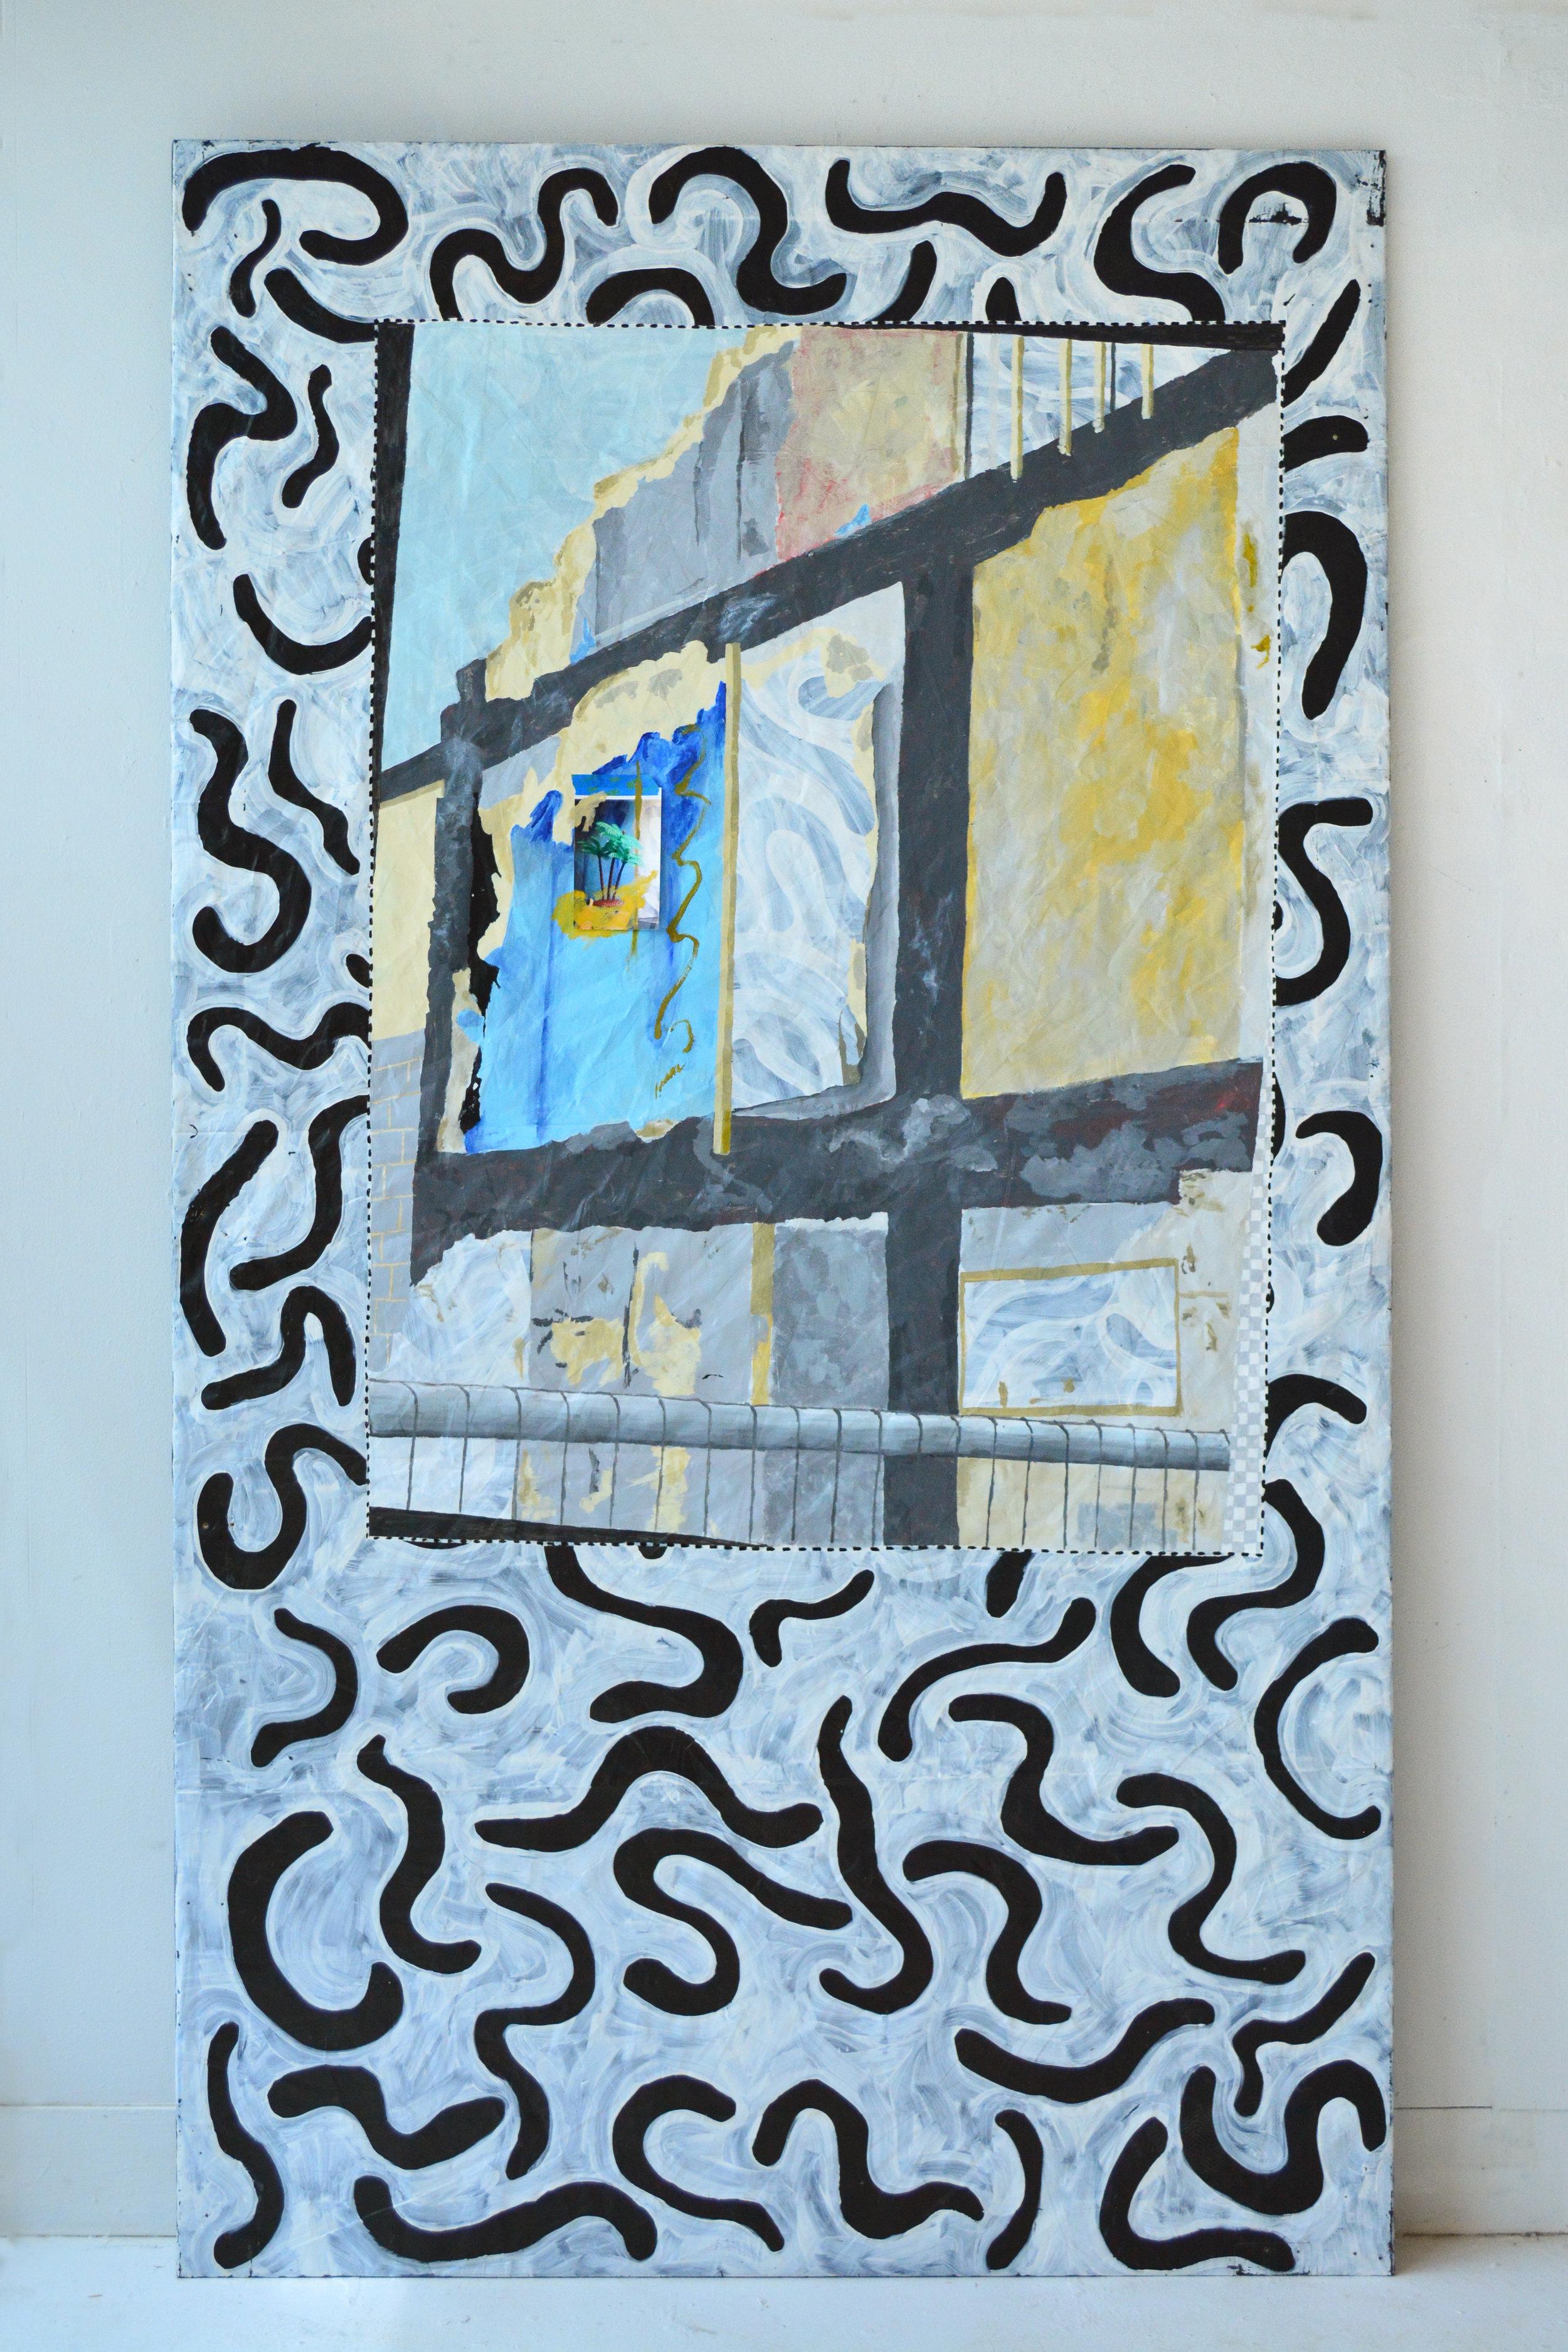 - Seaham Harbour2016Vinyl, acrylic, plastic, photograph, tape, wood.8' x 4.5'